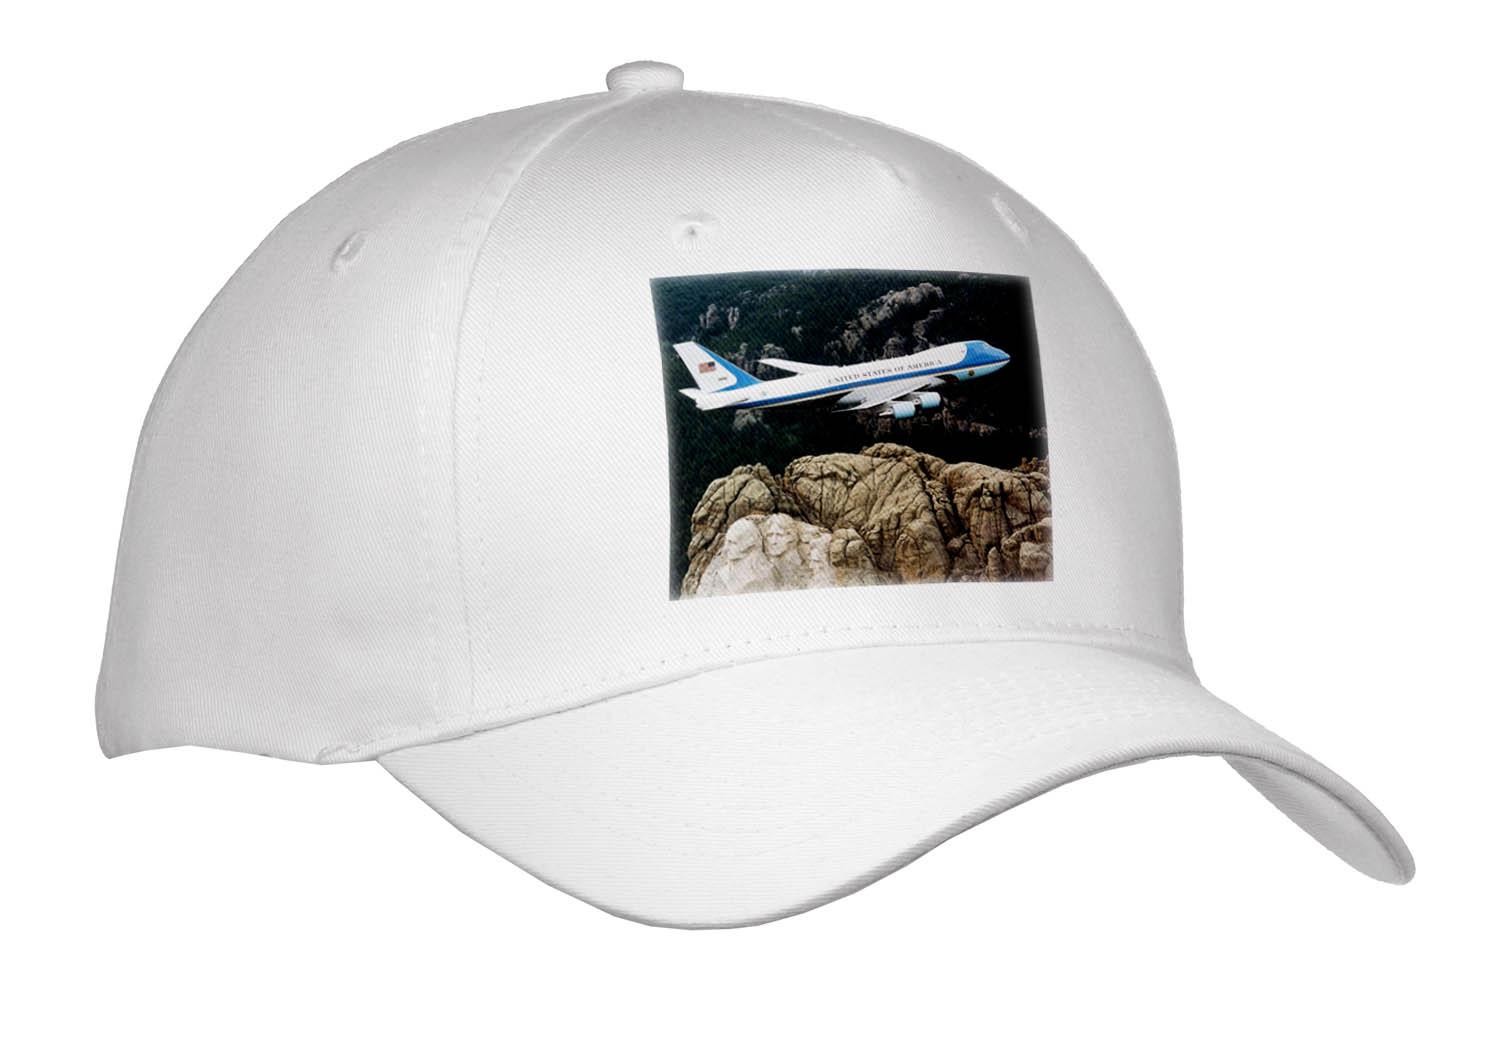 3dRose - Florene Transportation - Air Force 1 Flying Over Mount Rushmore.jpg - Caps